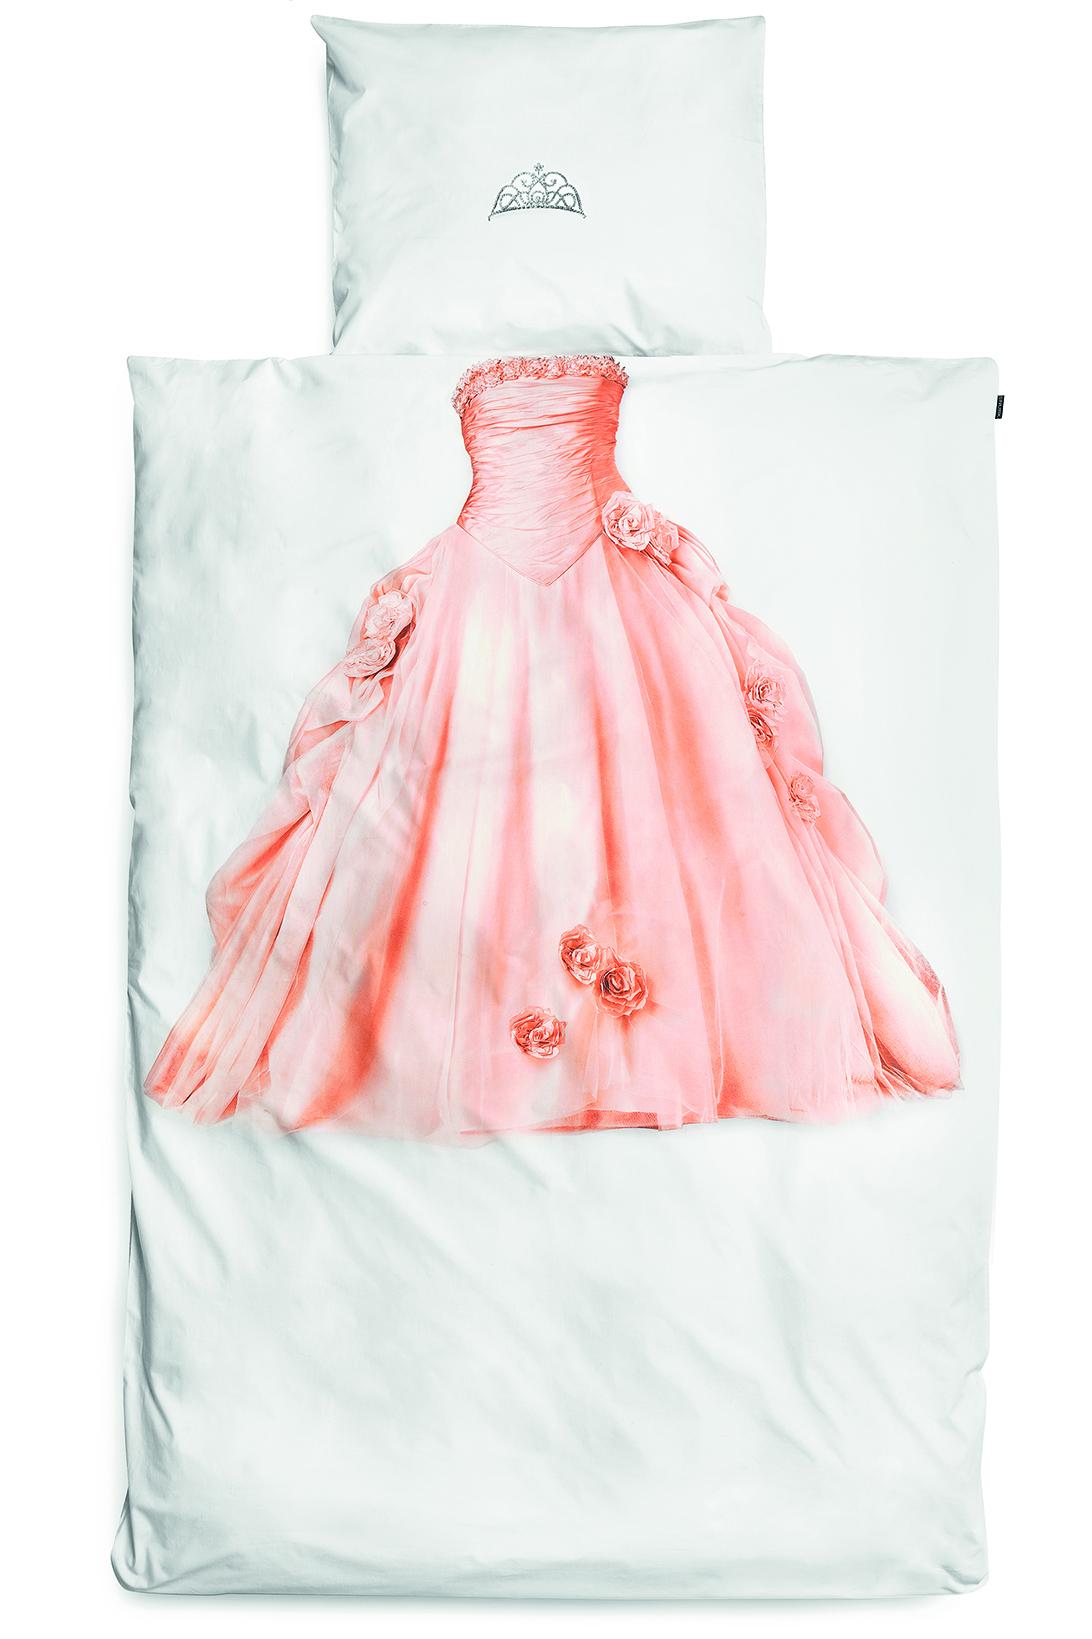 Decor Accessories Linen Princess Duvet Cover And